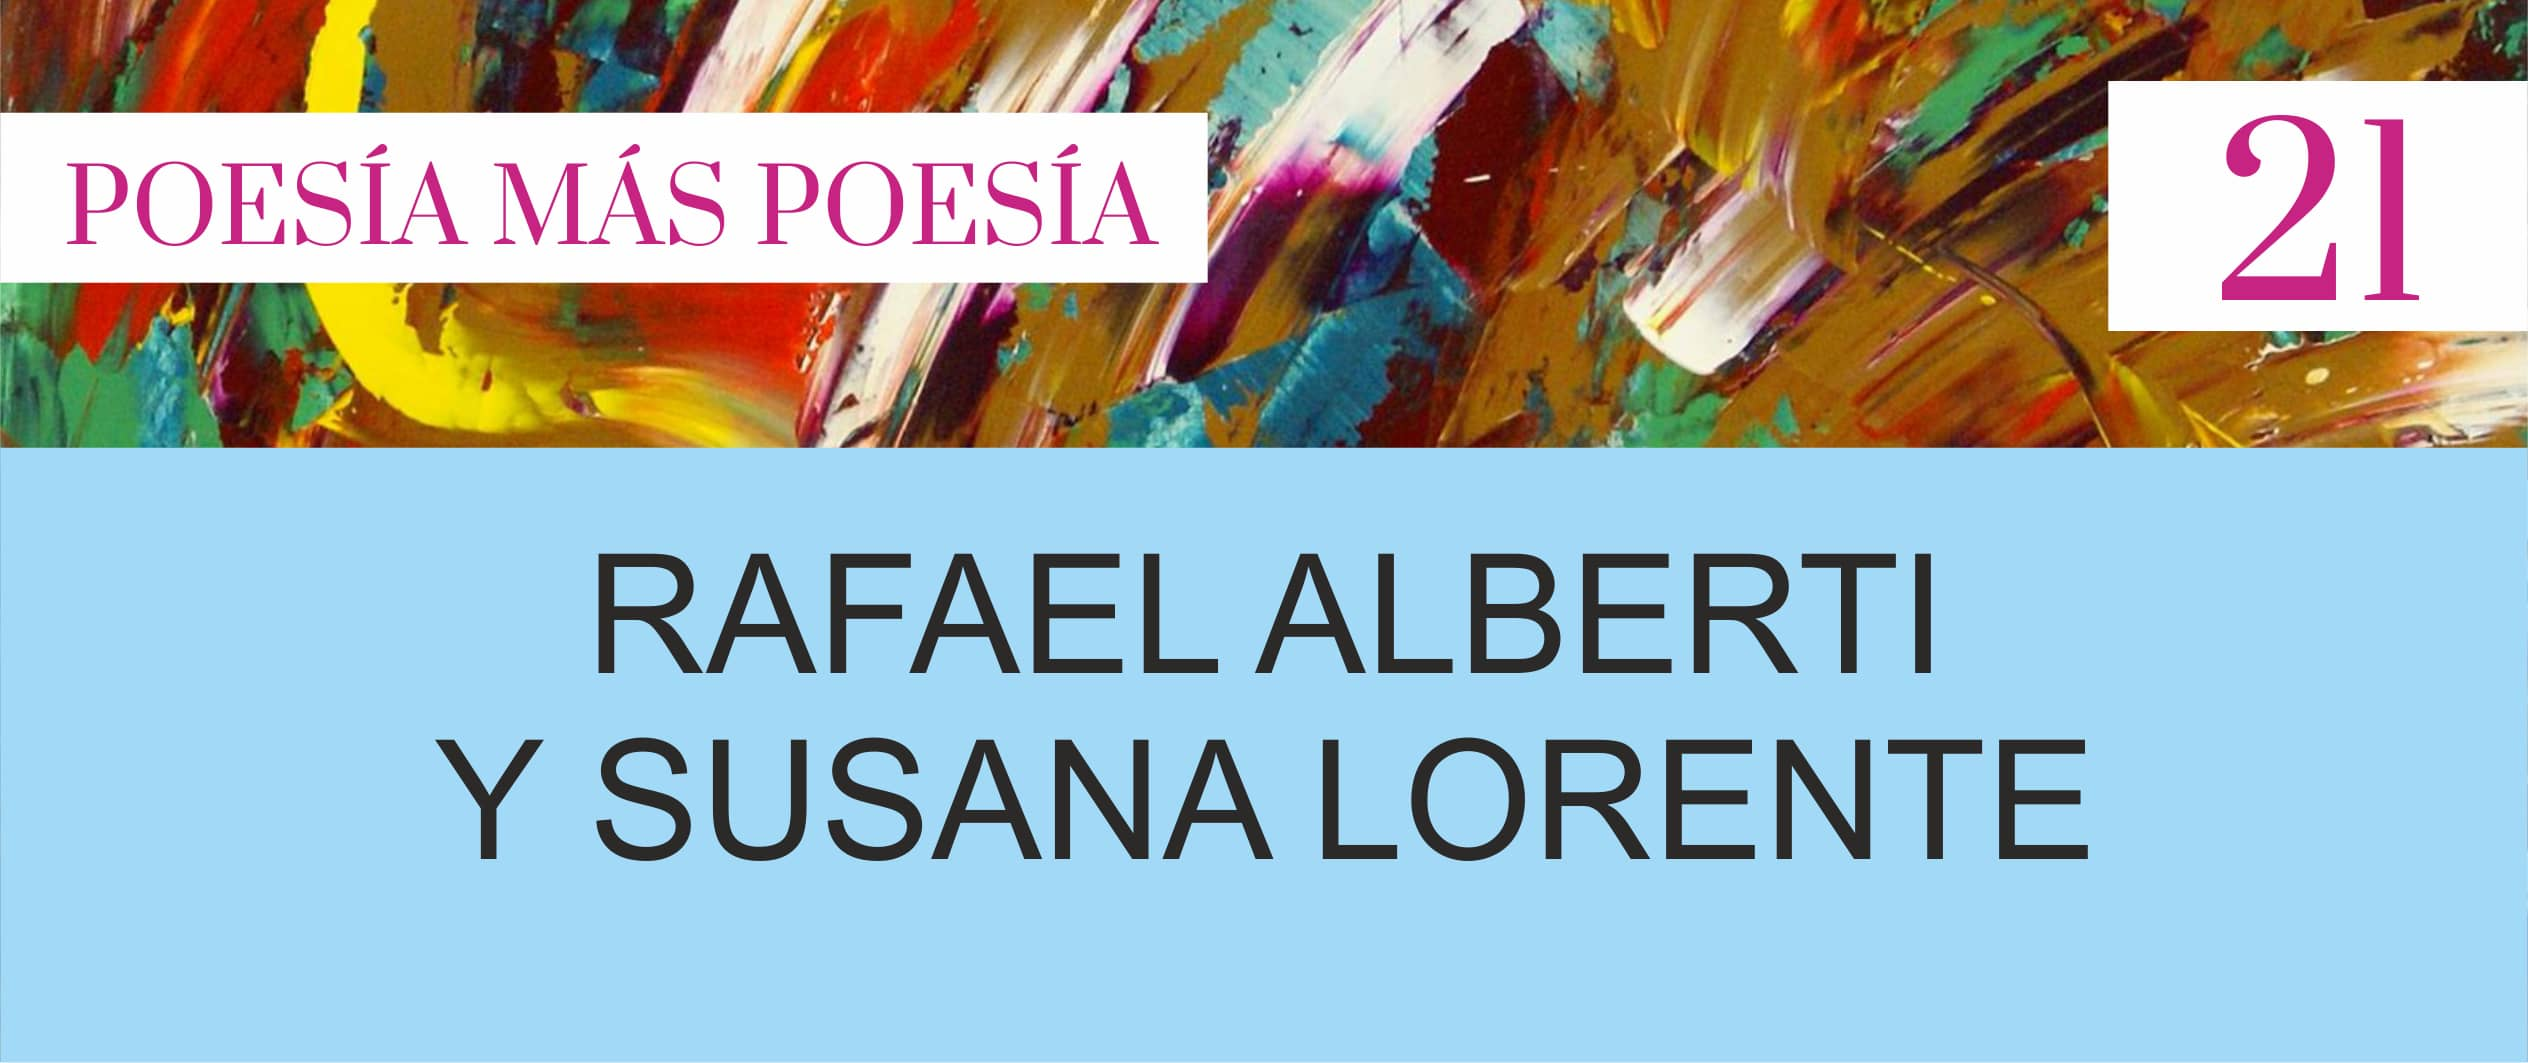 poesia mas poesia rafael alberti generacion del 27 - Poesia Online